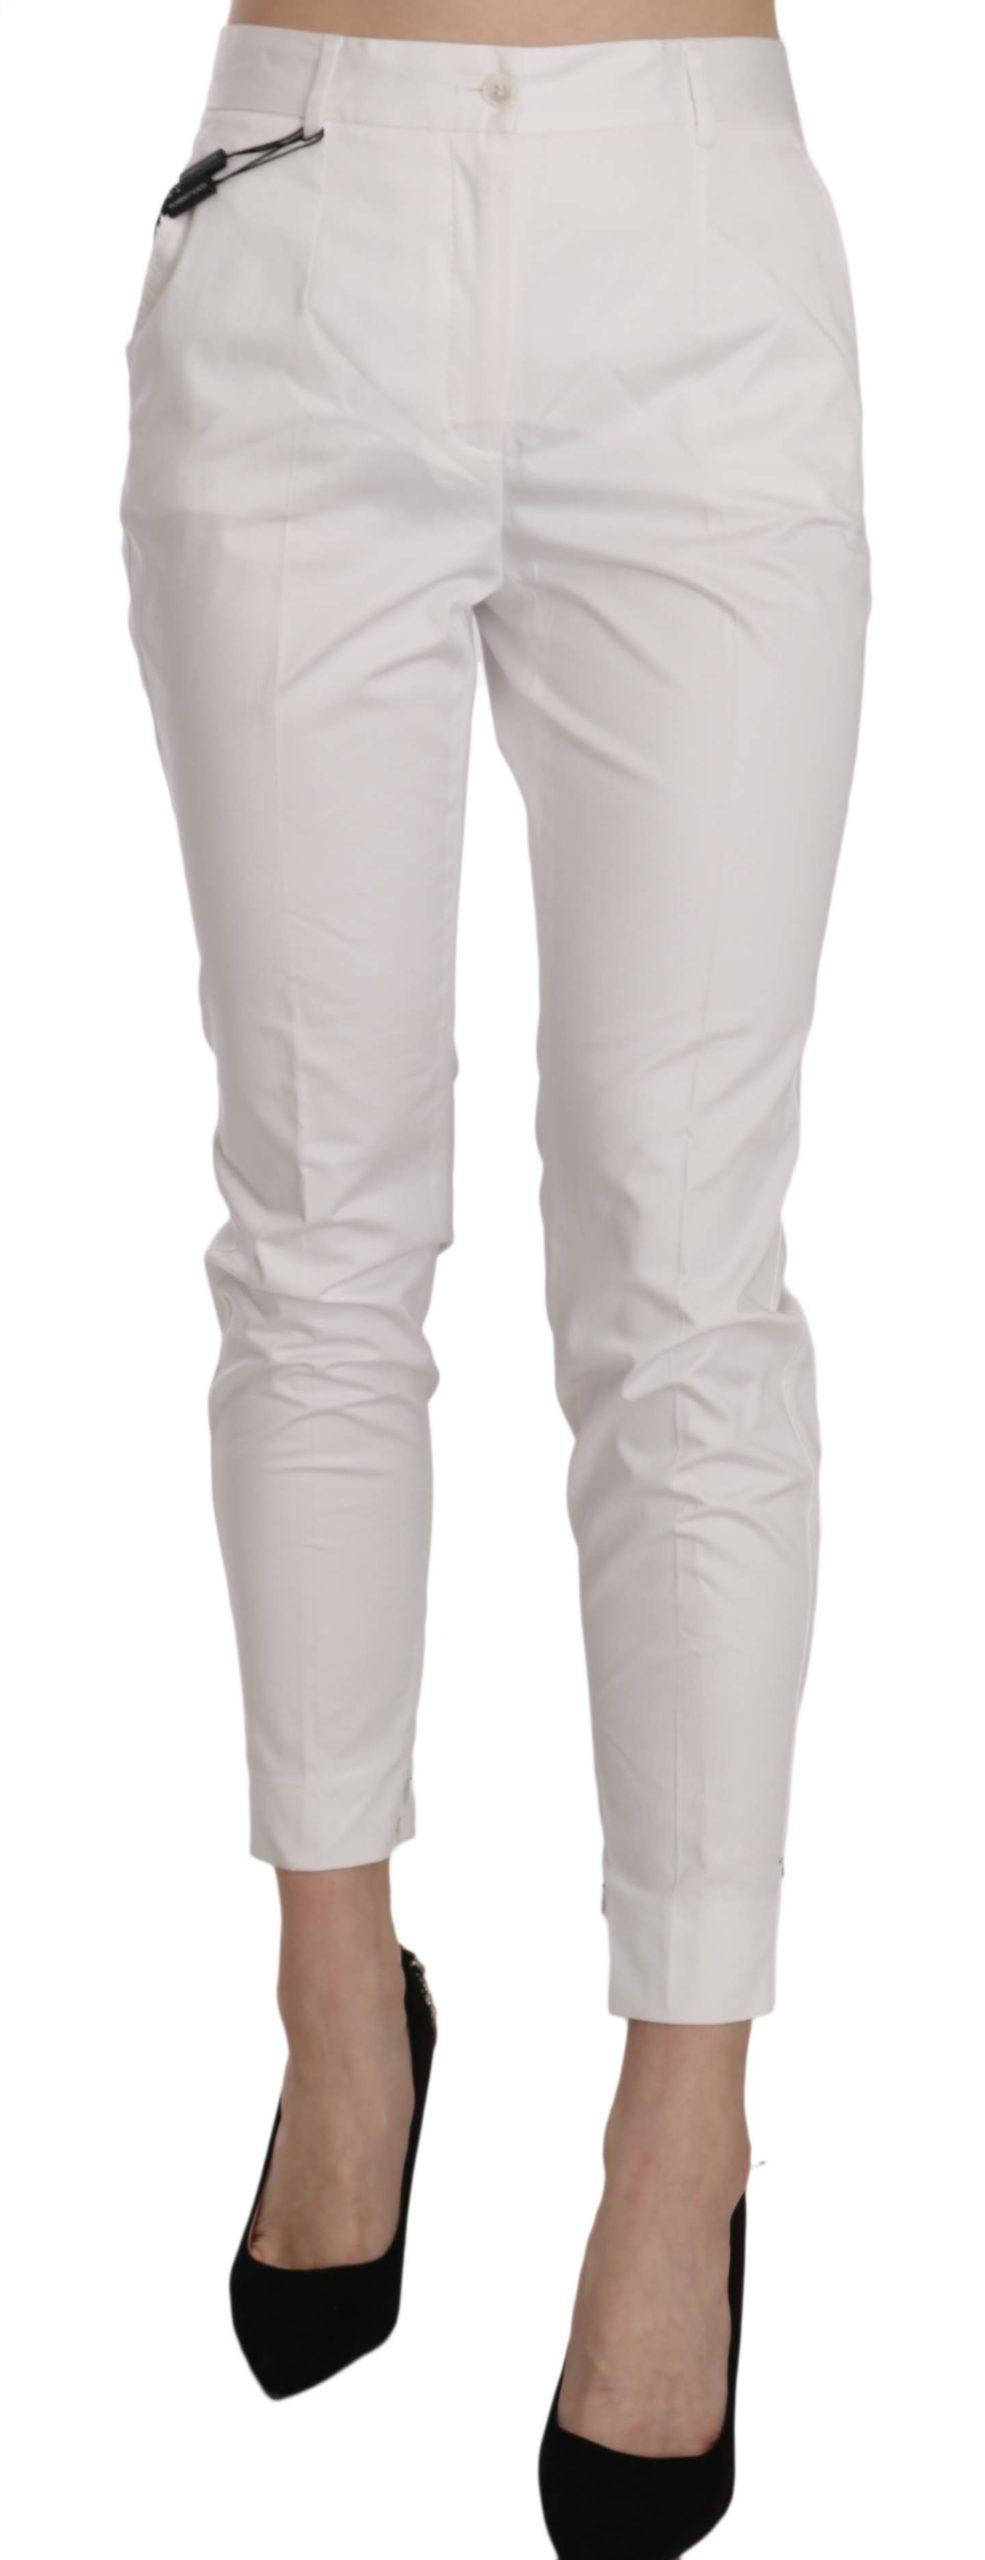 Dolce & Gabbana Women's High Waist Skinny Cropped Trouser White PAN70279 - IT42|M